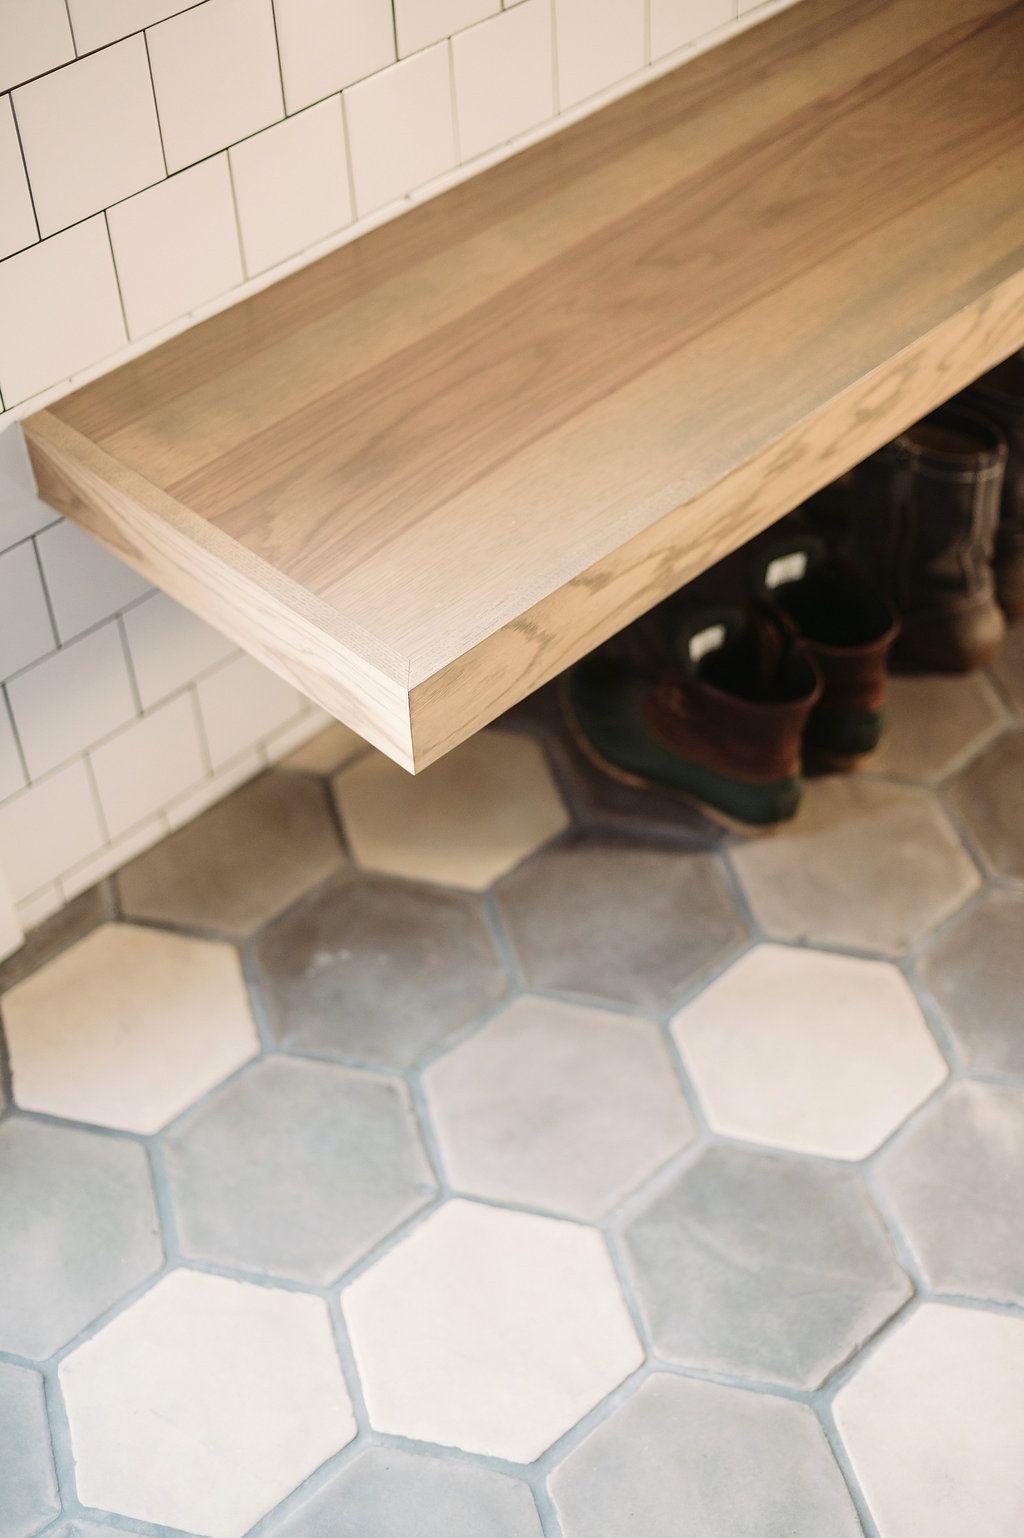 Concrete Tile Hexagon. & Concrete Tile Hexagon. | Arto Brick \u0026 Tile | Albacrete | Pinterest ...